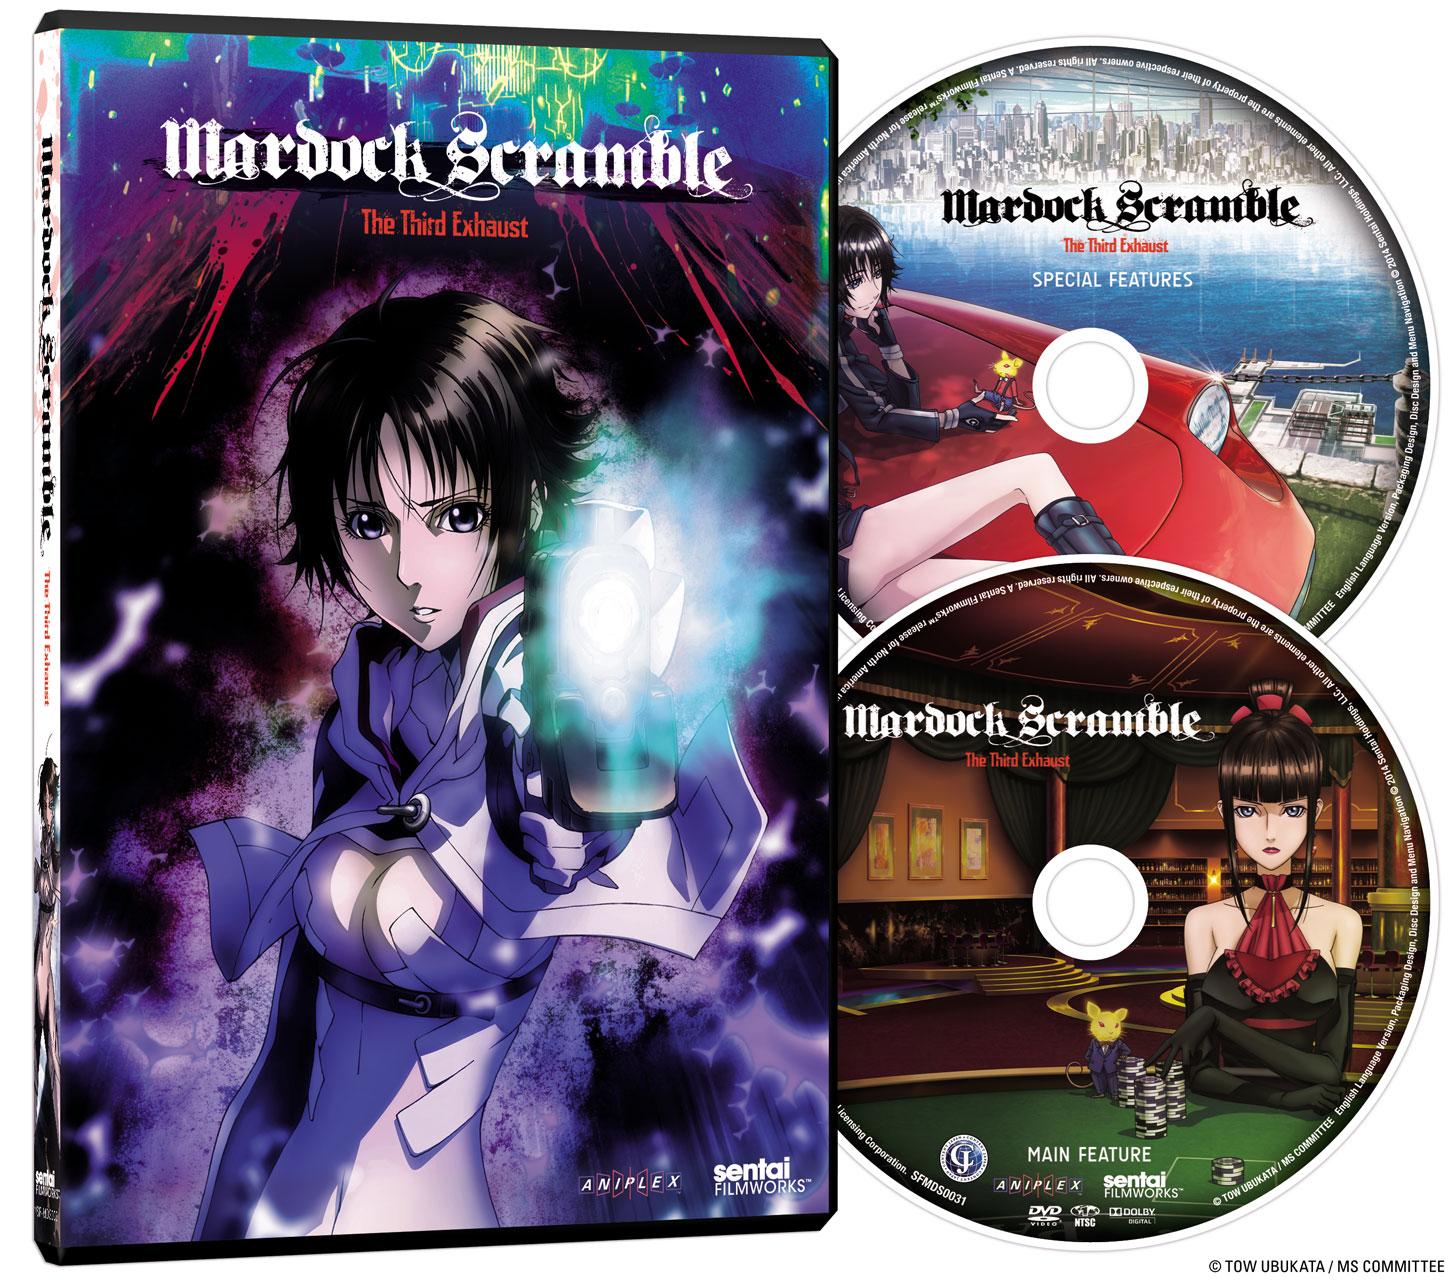 Mardock Scramble The Third Exhaust DVD Director's Cut